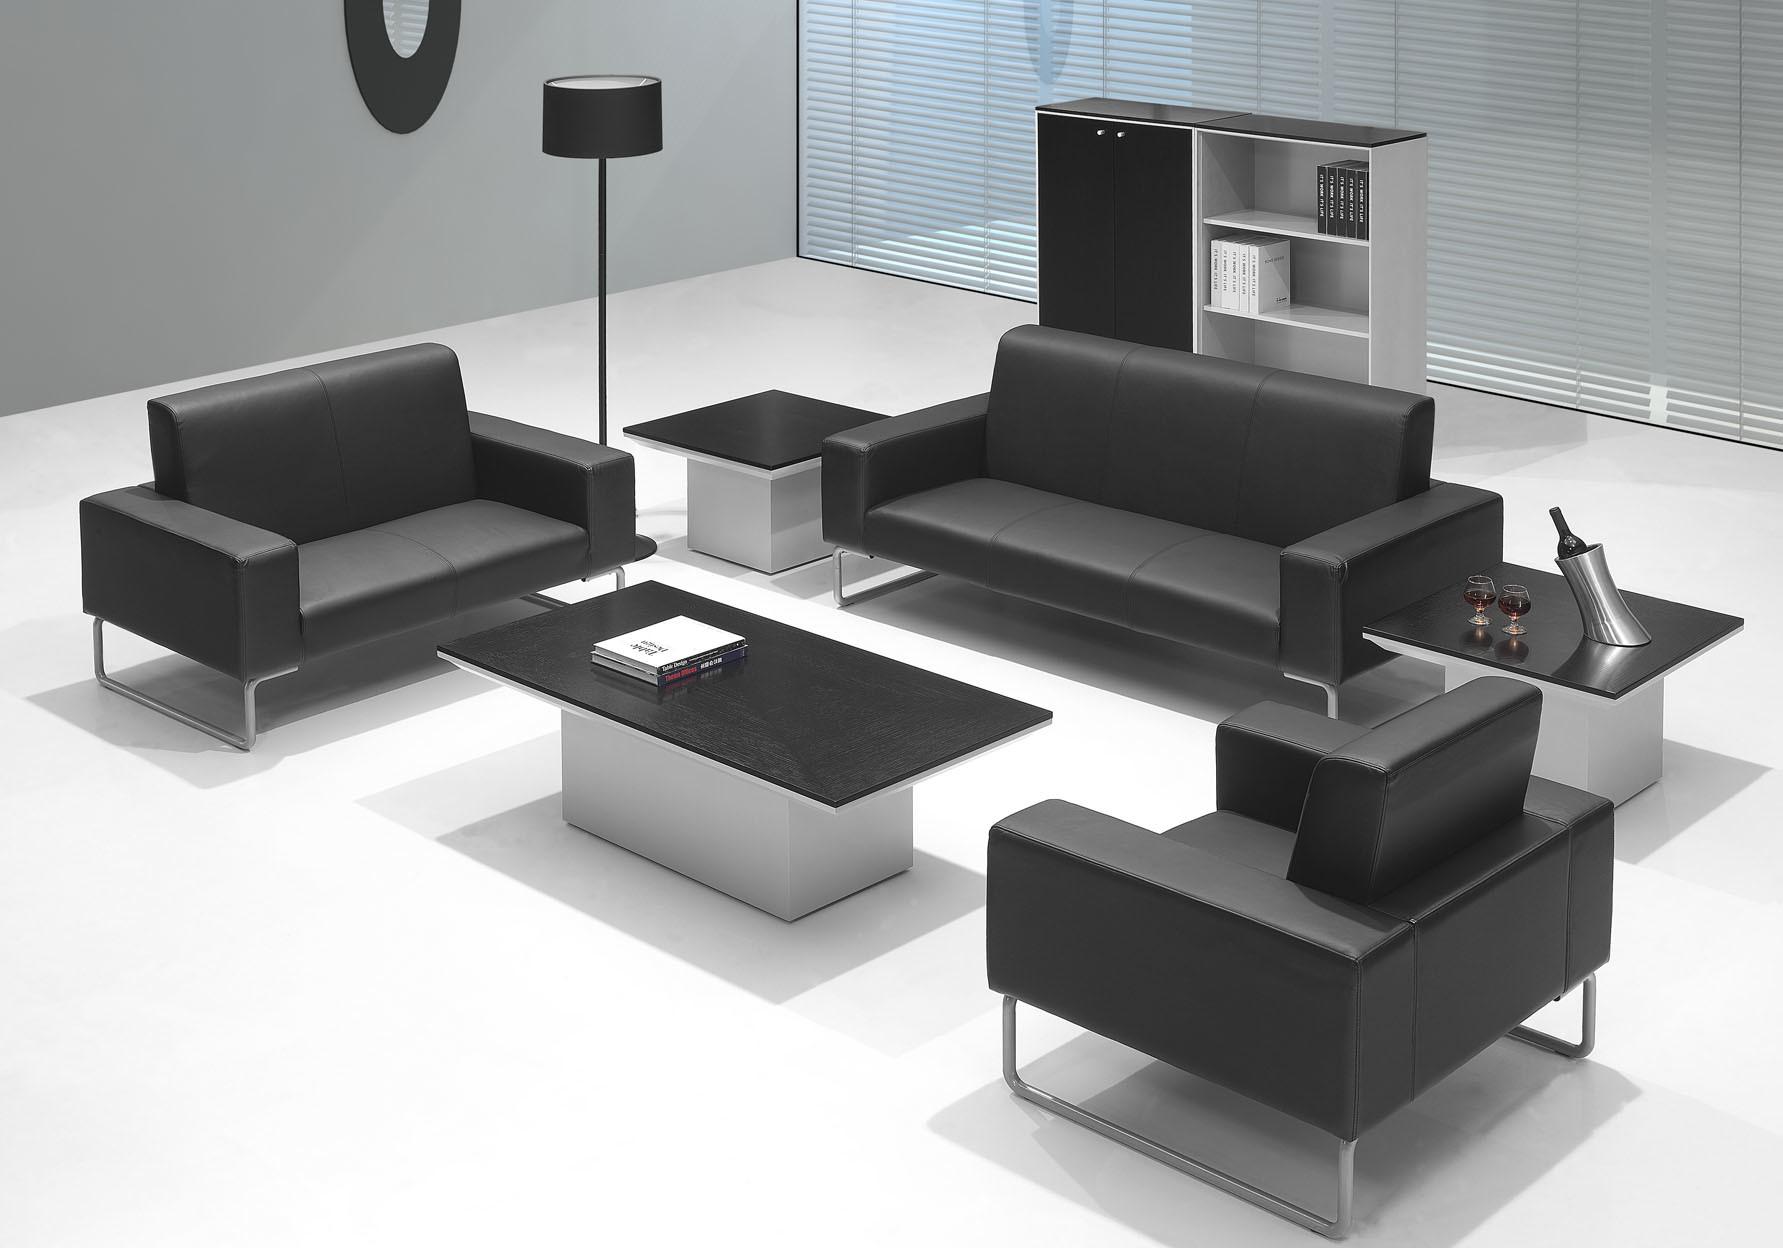 sofa in malaysia baxton studio kaspar slate gray fabric modern sectional office furniture